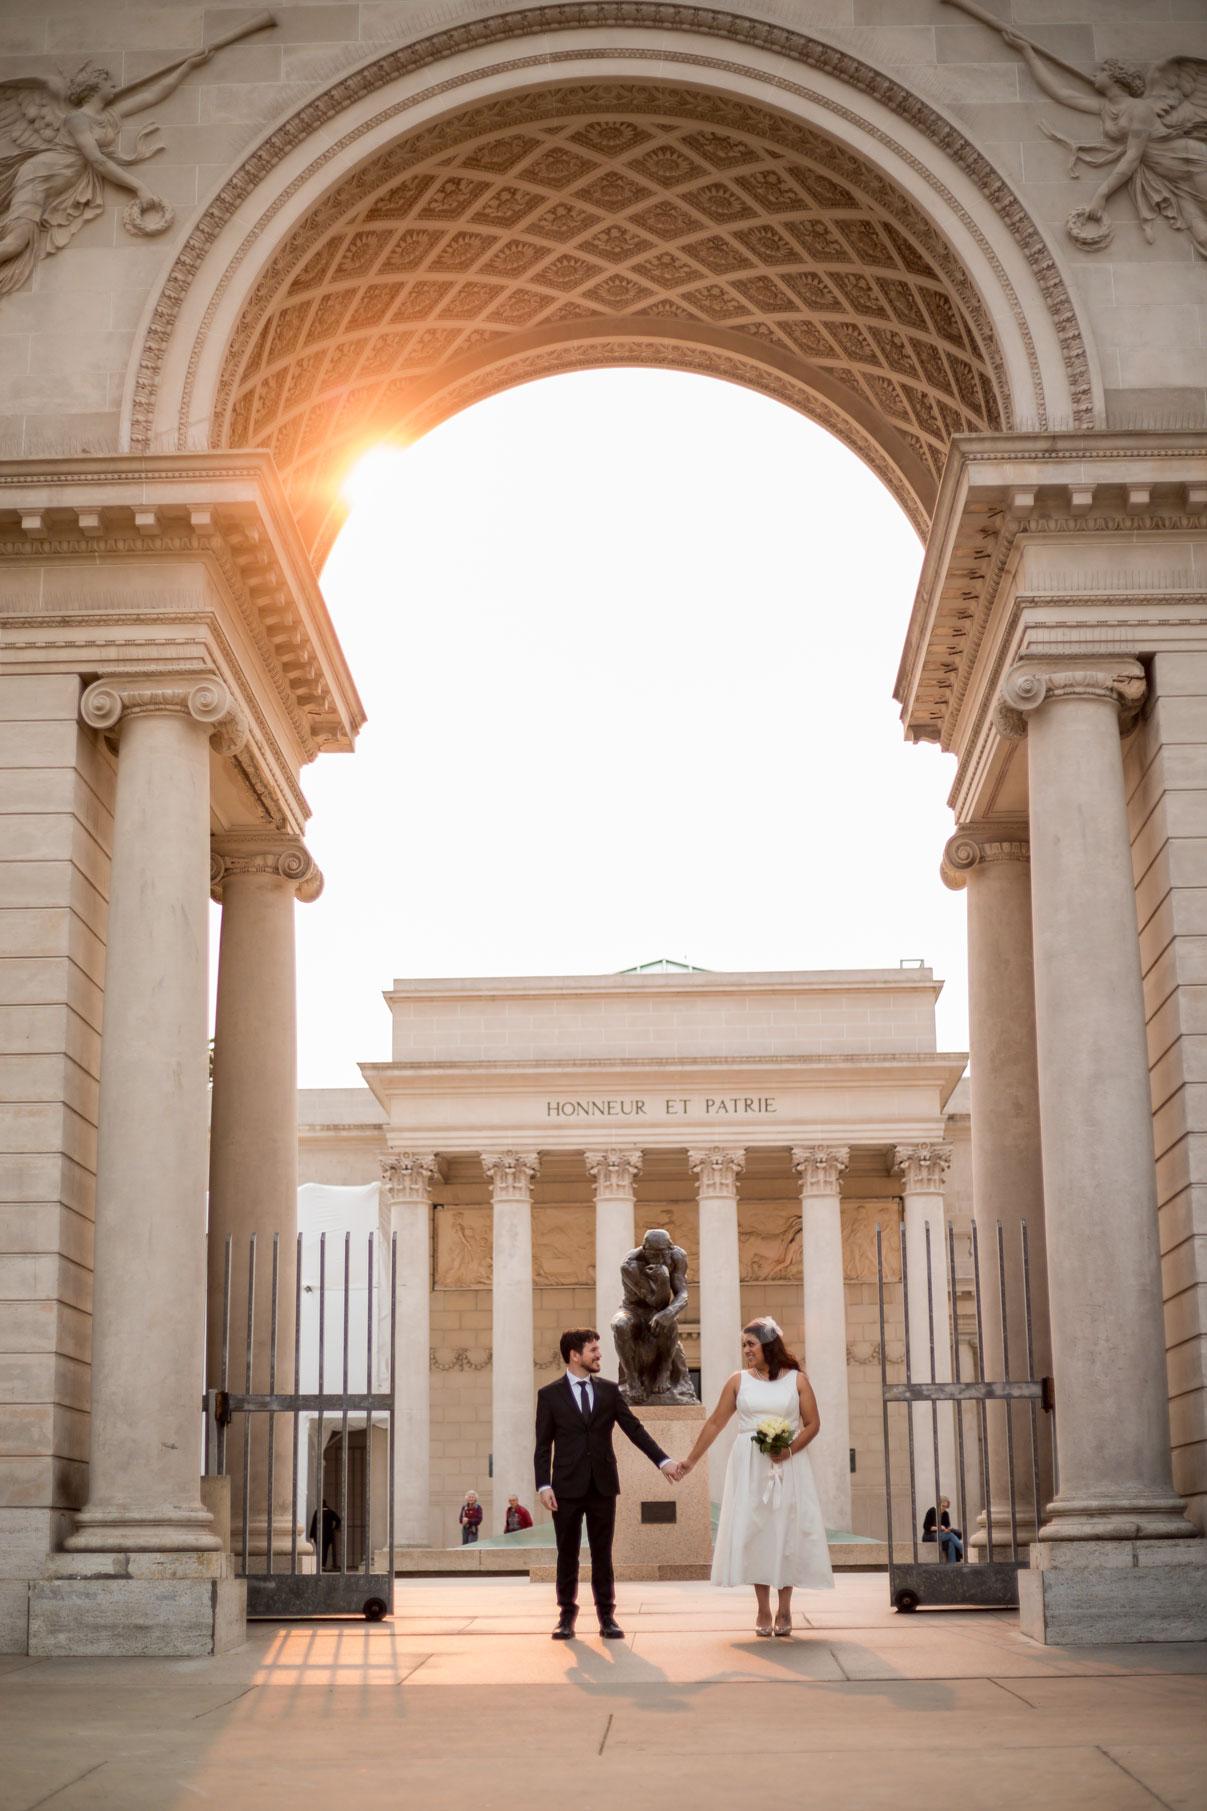 https://bworthyphotography.smugmug.com/BW-Website-Wedding-Session/Laiwalla-Wedding